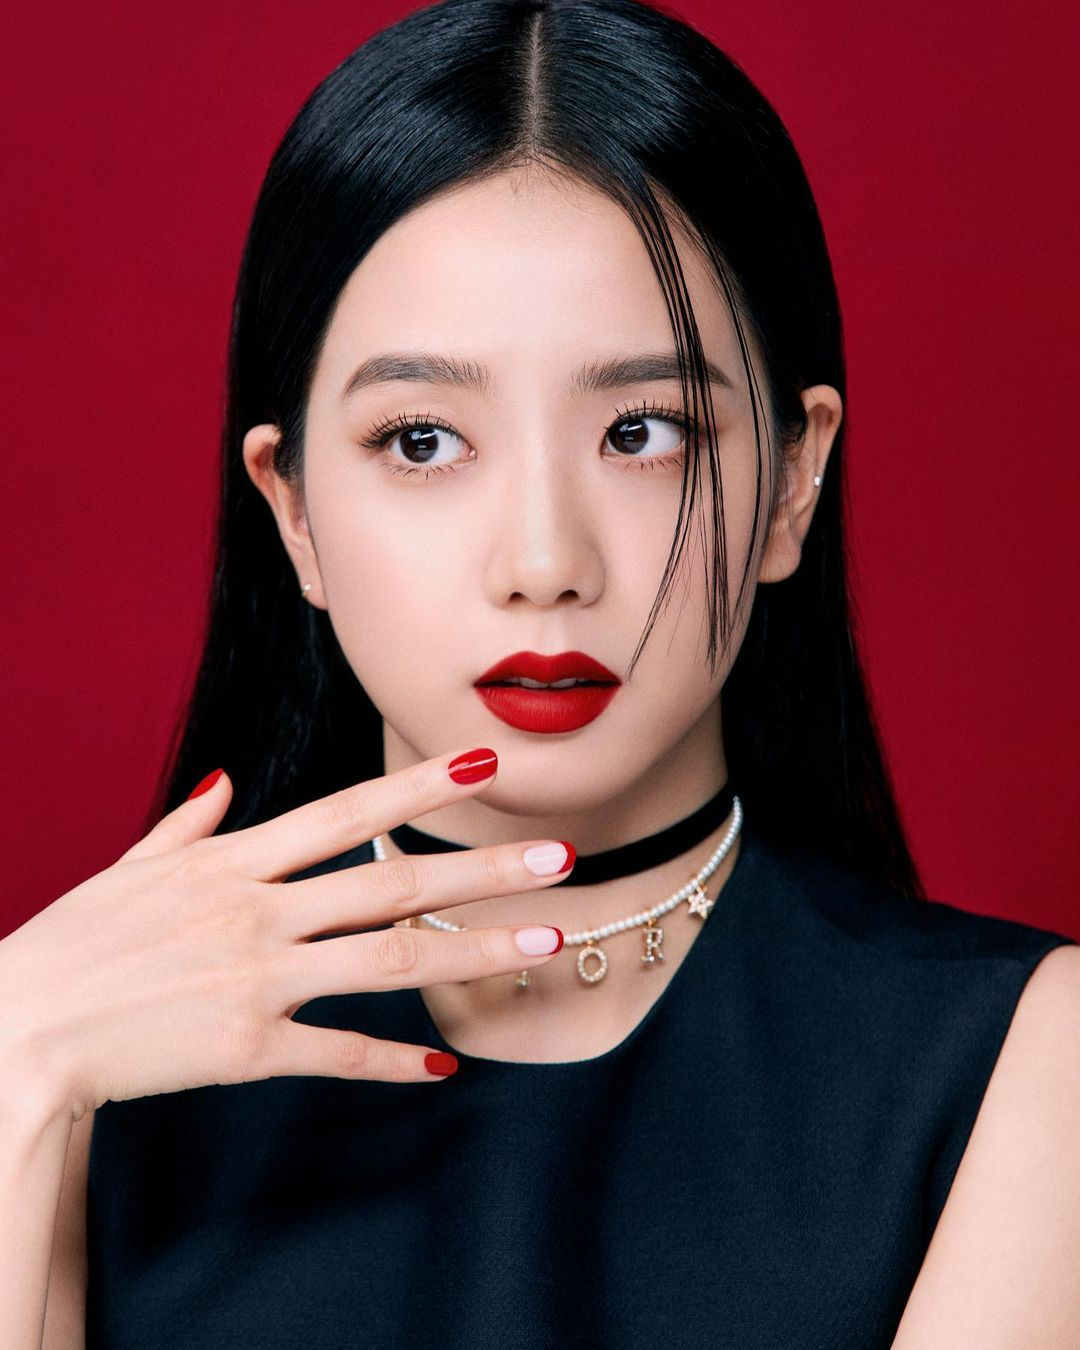 BLACKPINK's Jisoo for Dior